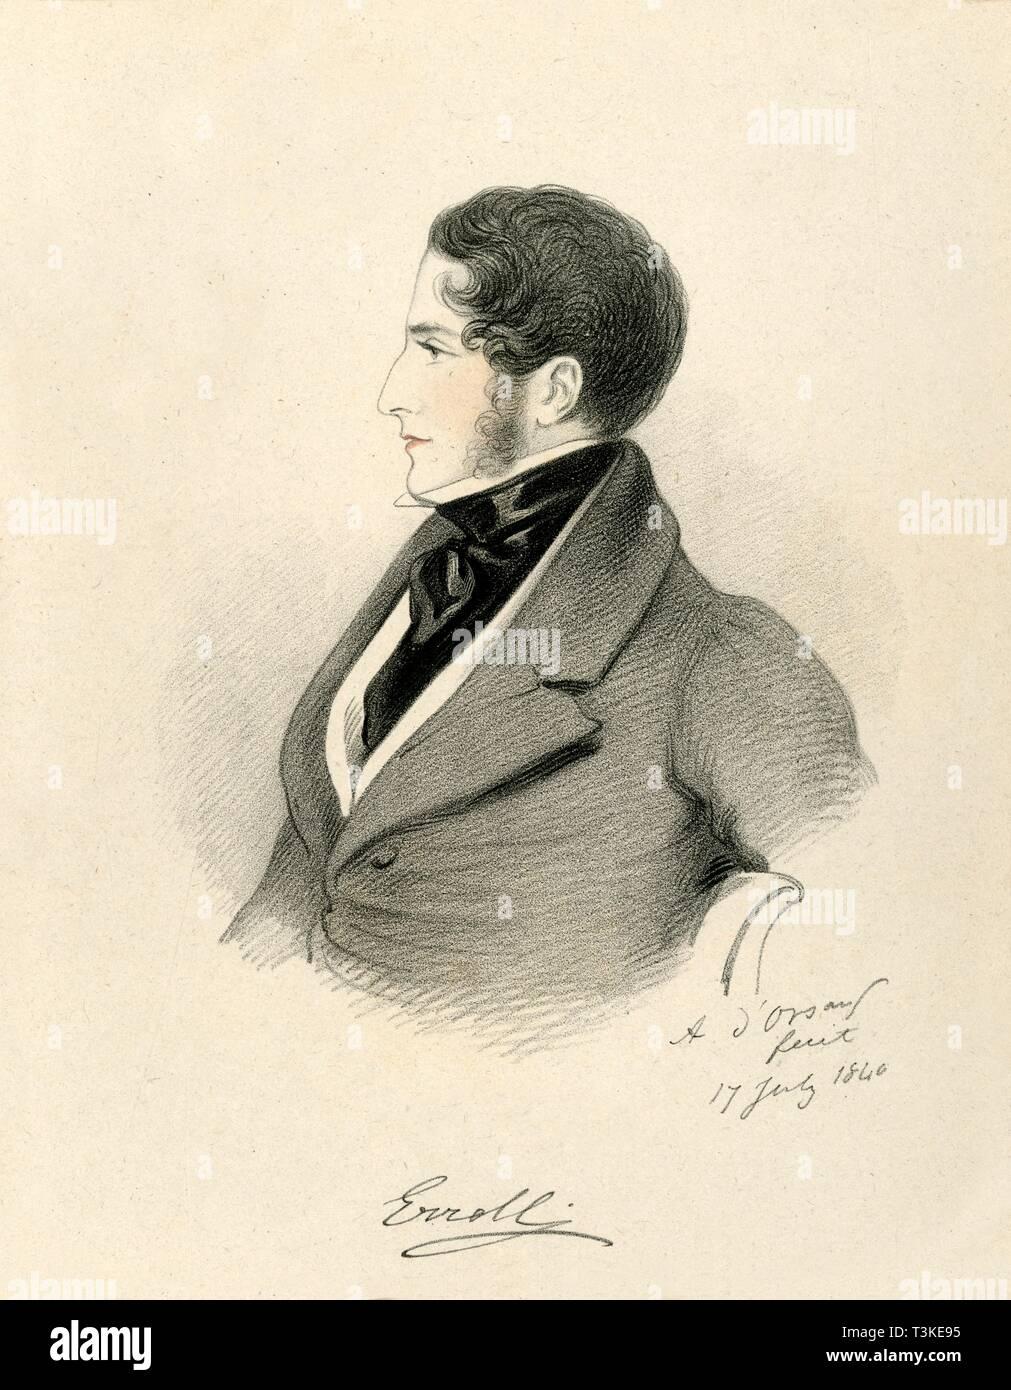 'The Earl of Erroll', 1840. Creator: Richard James Lane. - Stock Image